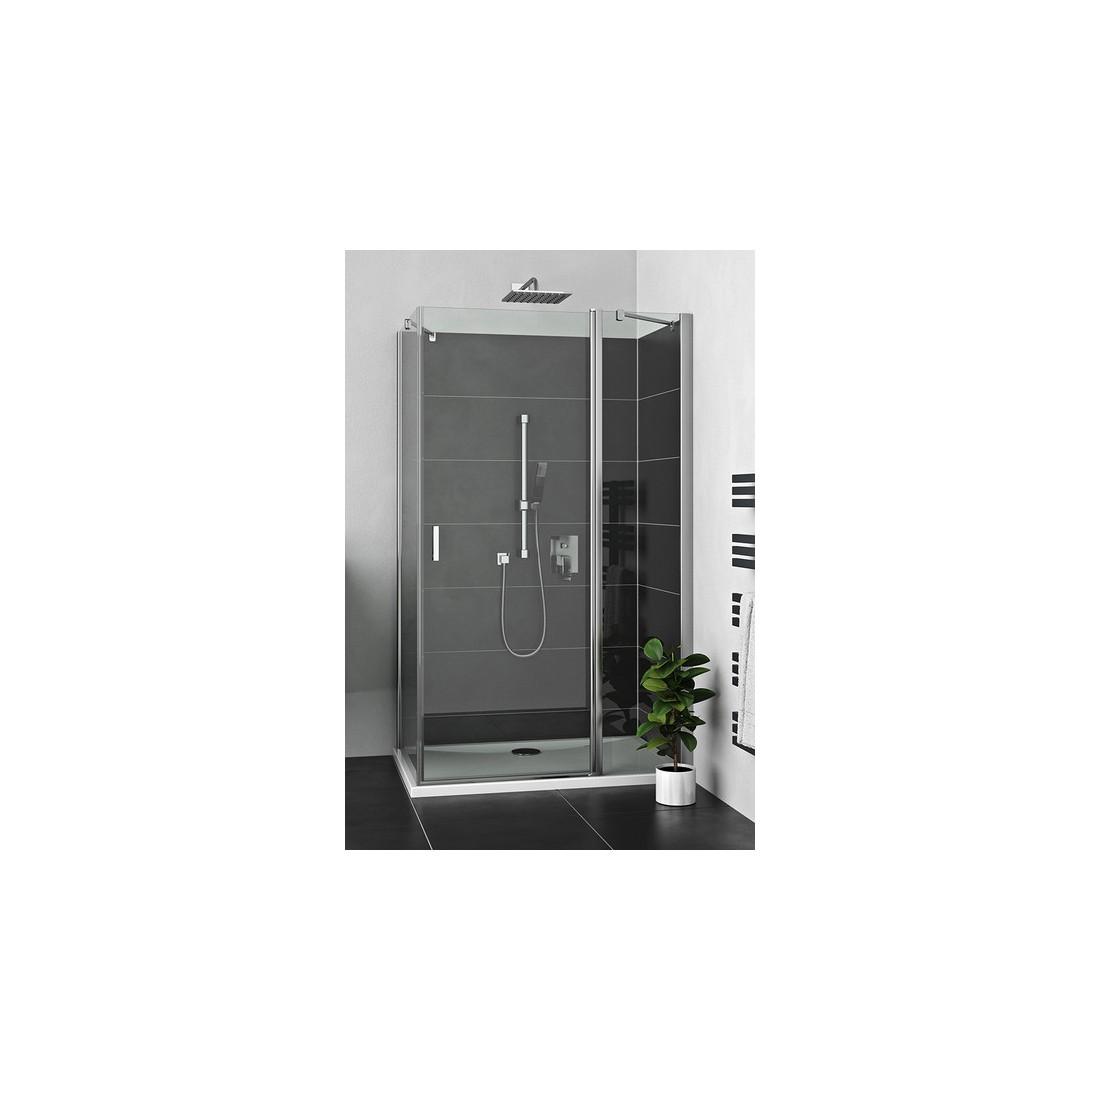 Šoninė siena LZB/900 durims LZDO1, prof. brillant, sikl. transparent